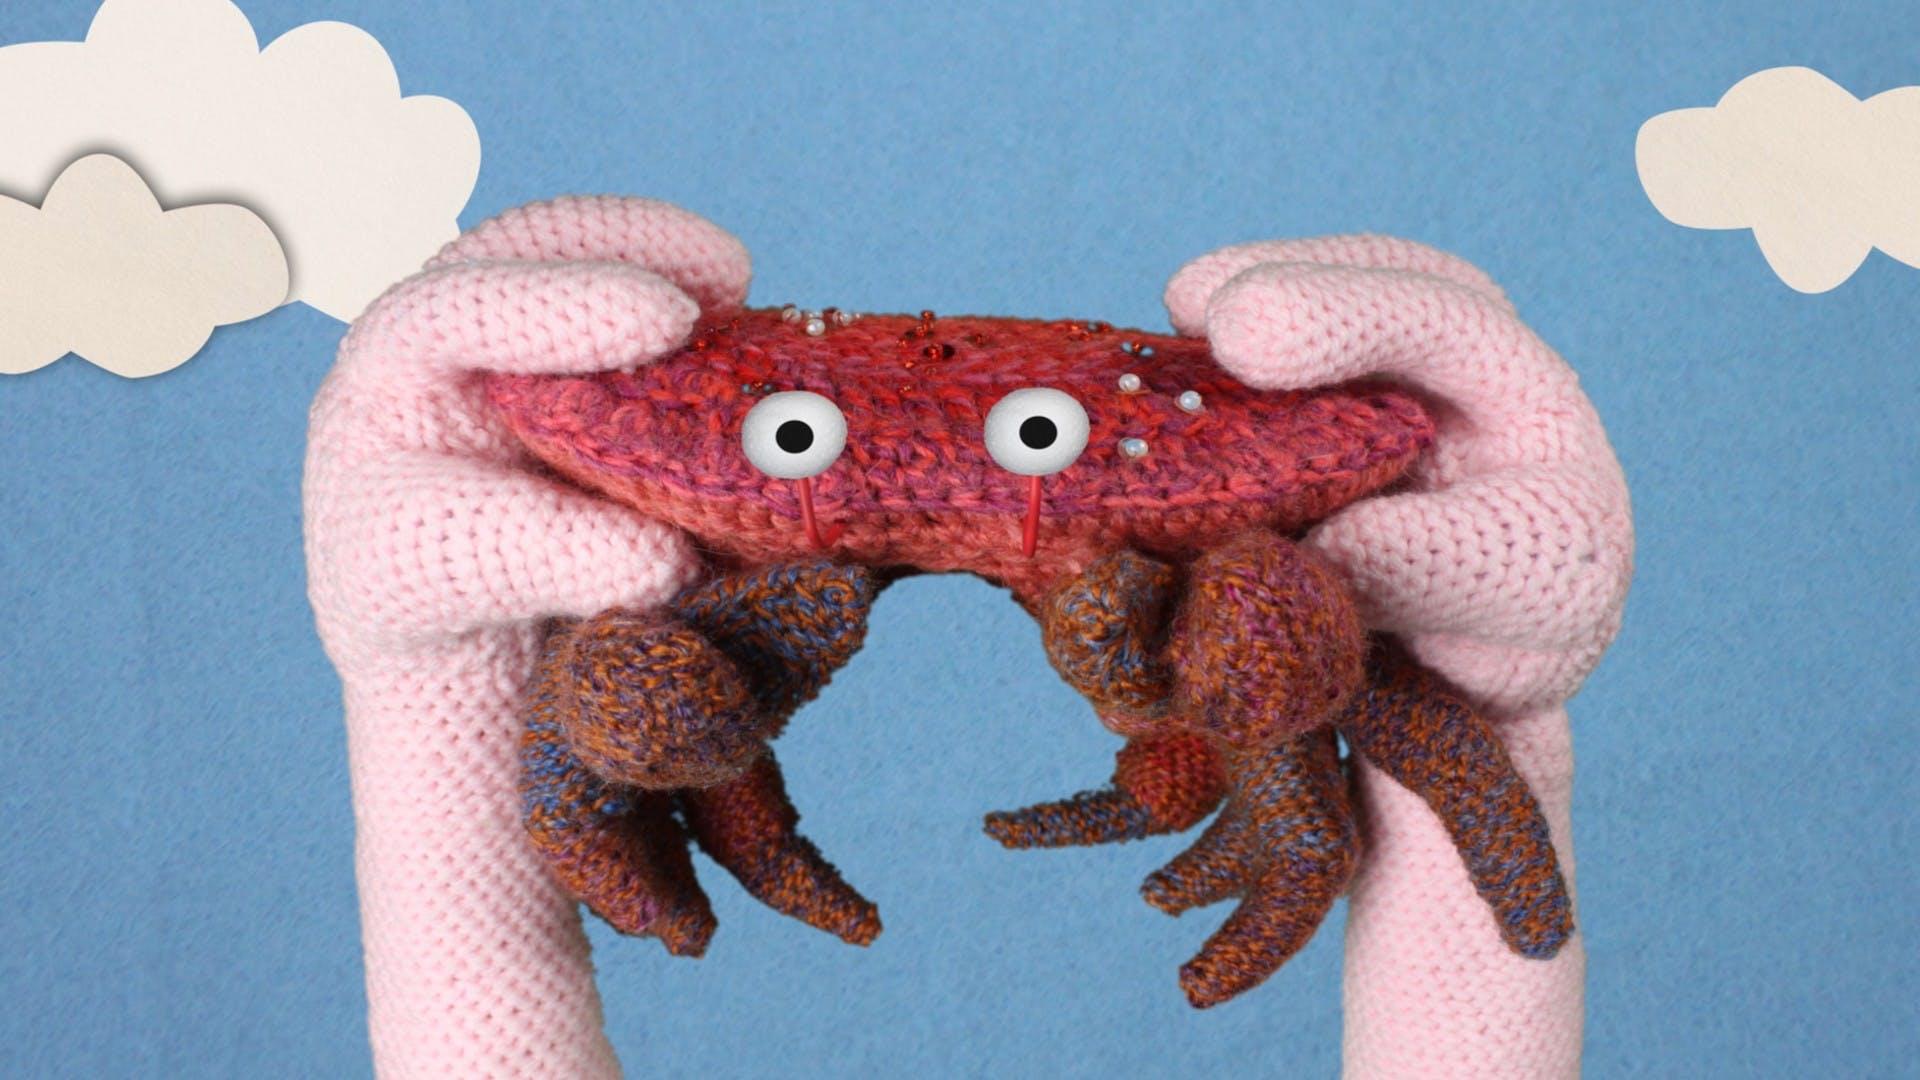 Pretty Crabby himself